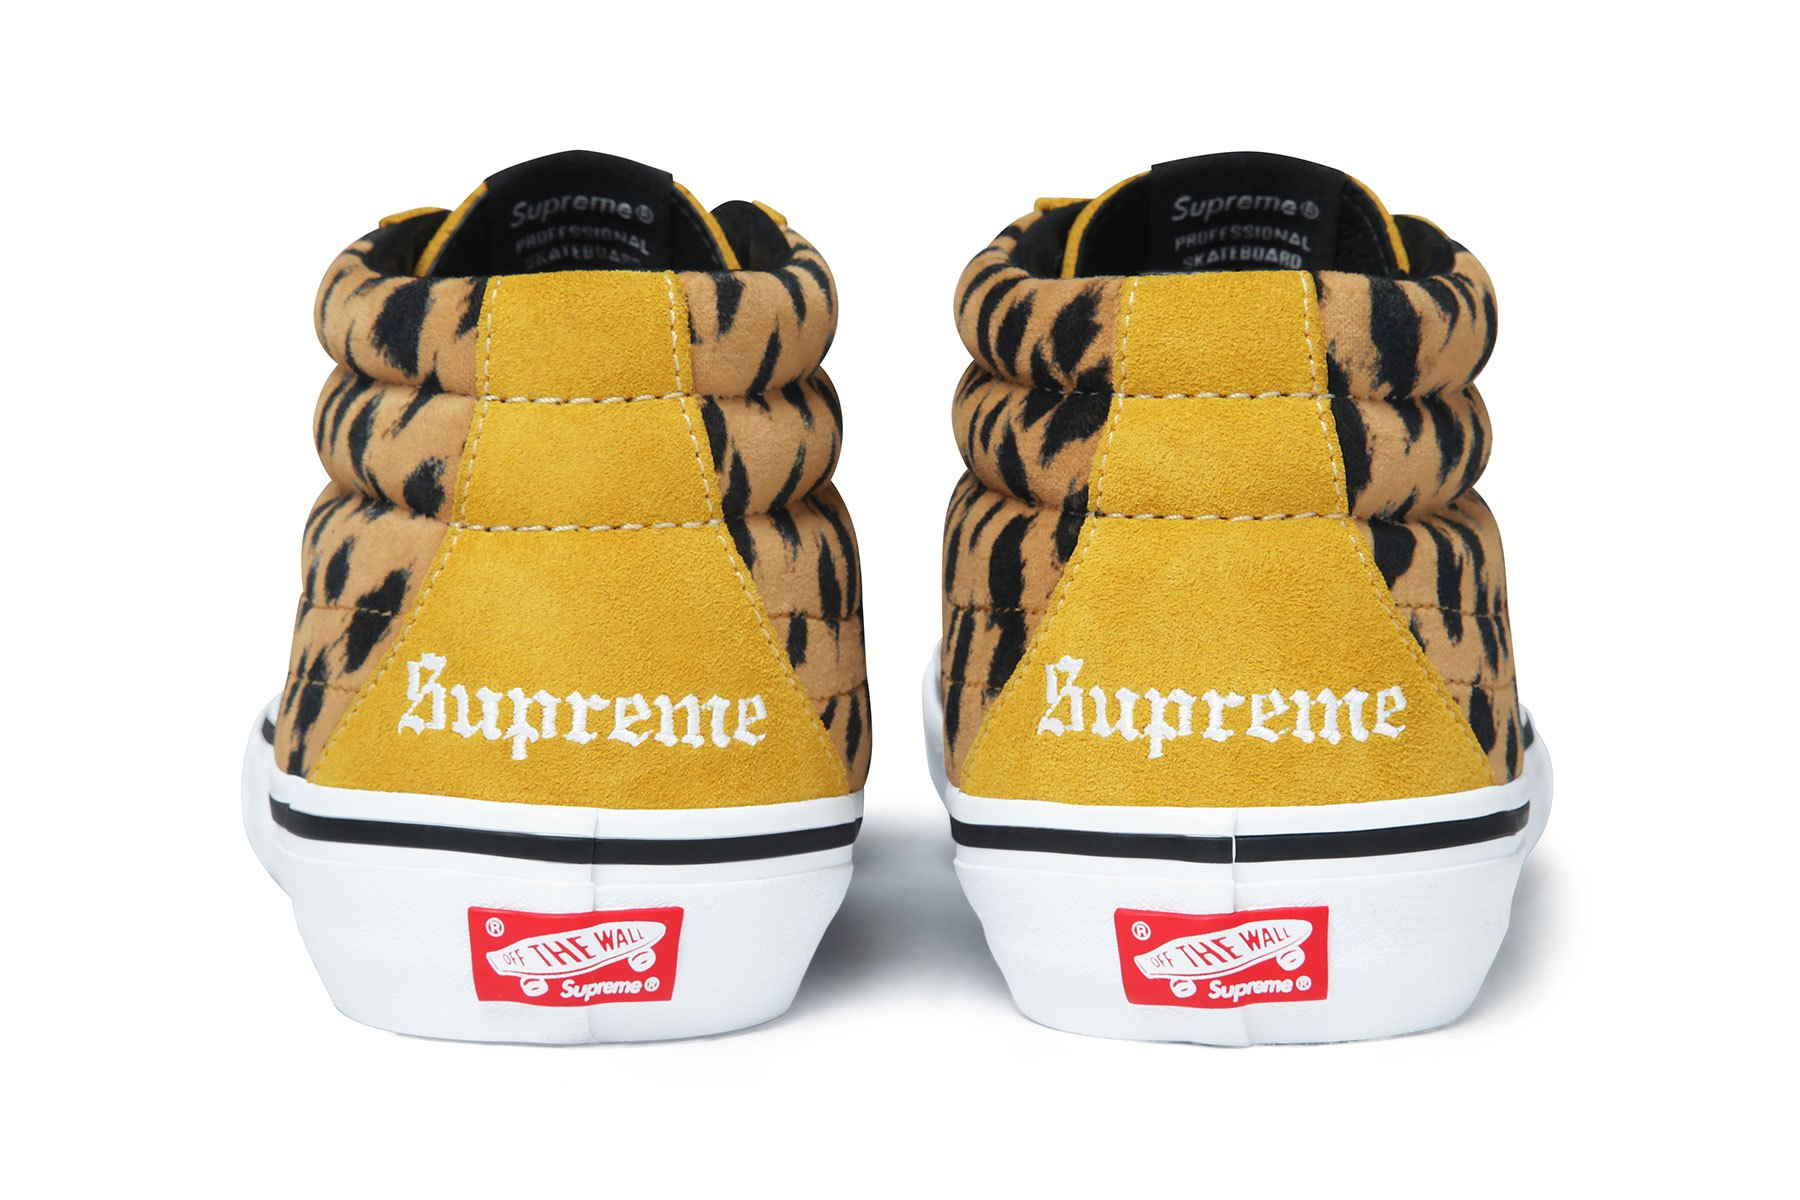 supreme-vans-2017-spring-summer-leopard-yellow-3